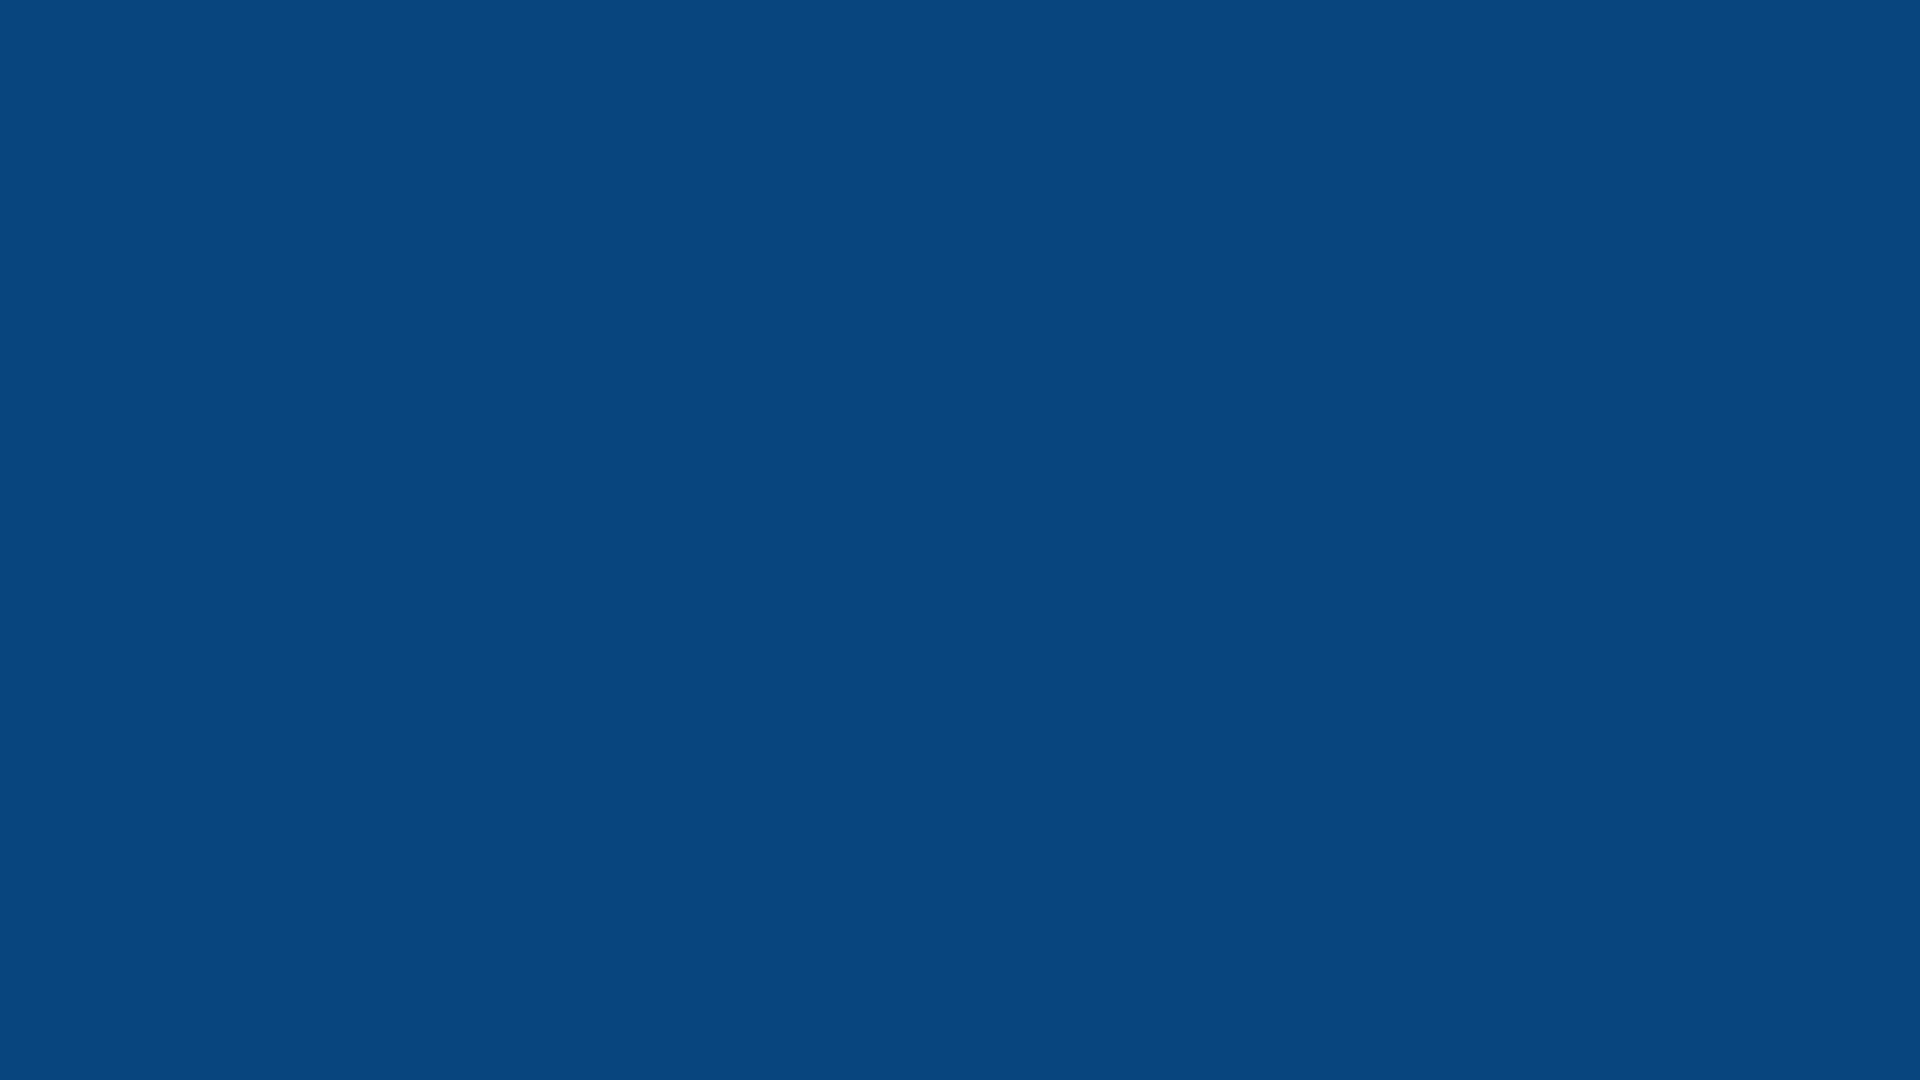 1920x1080 Dark Cerulean Solid Color Background